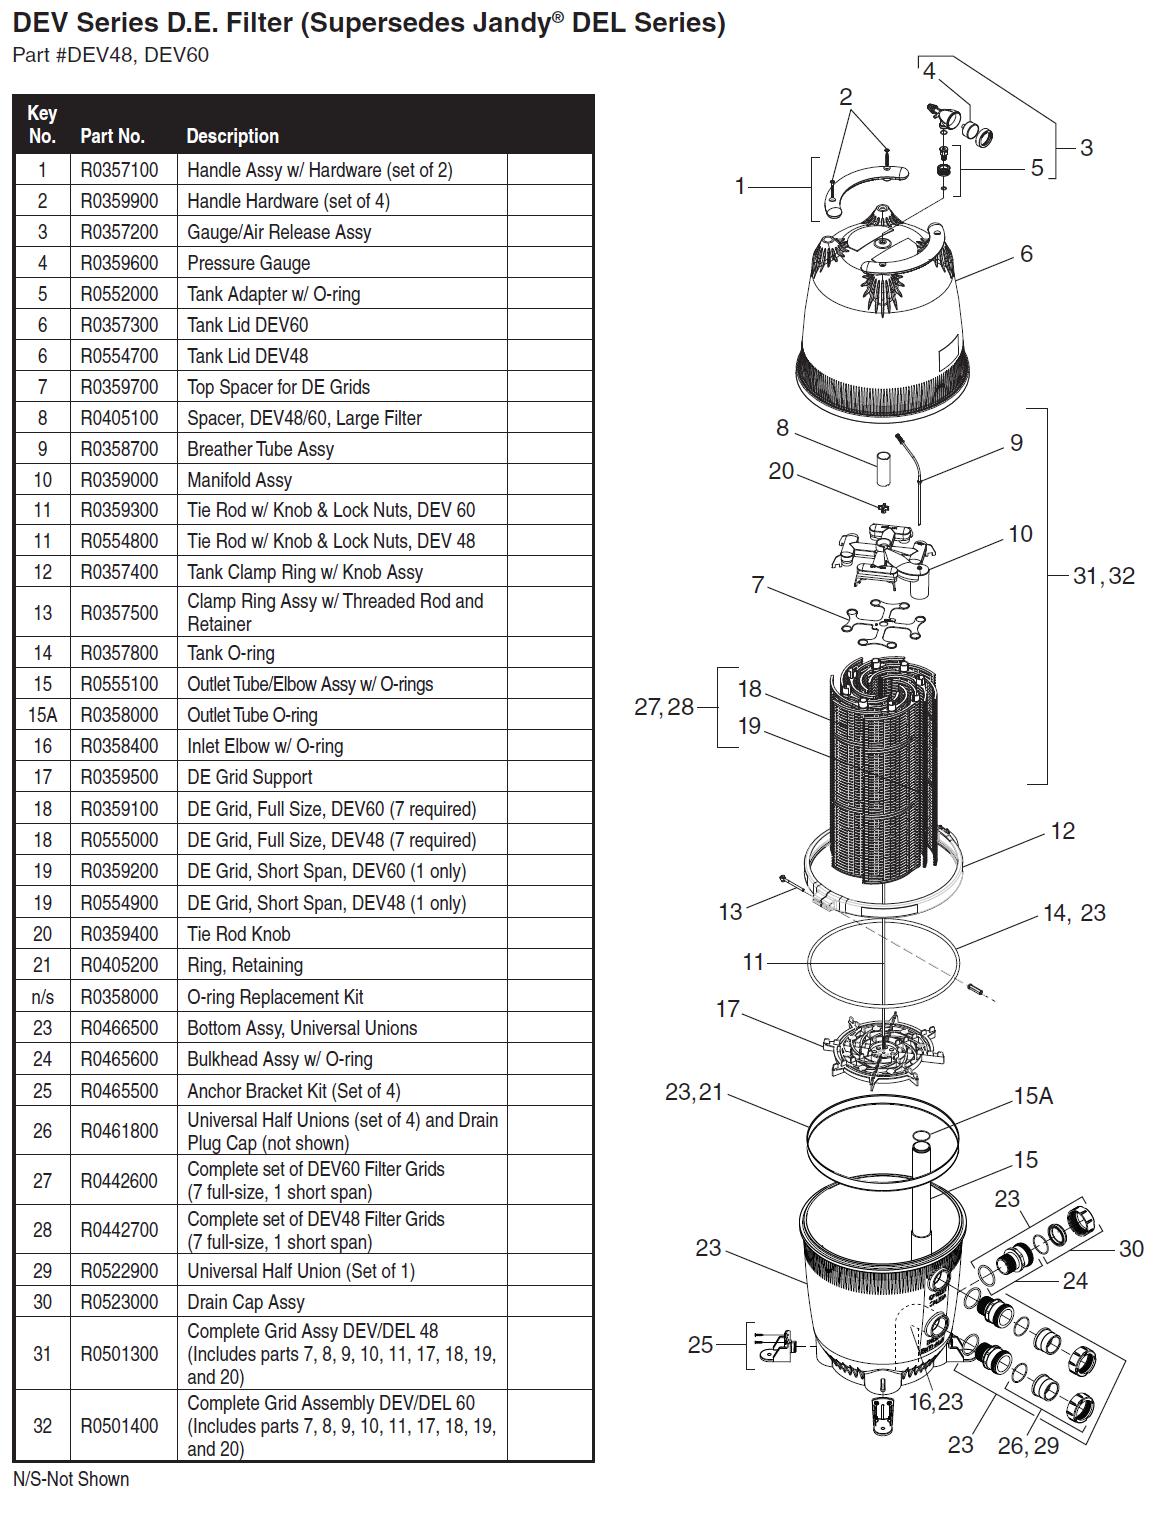 Jandy Dev Series De Filter Parts